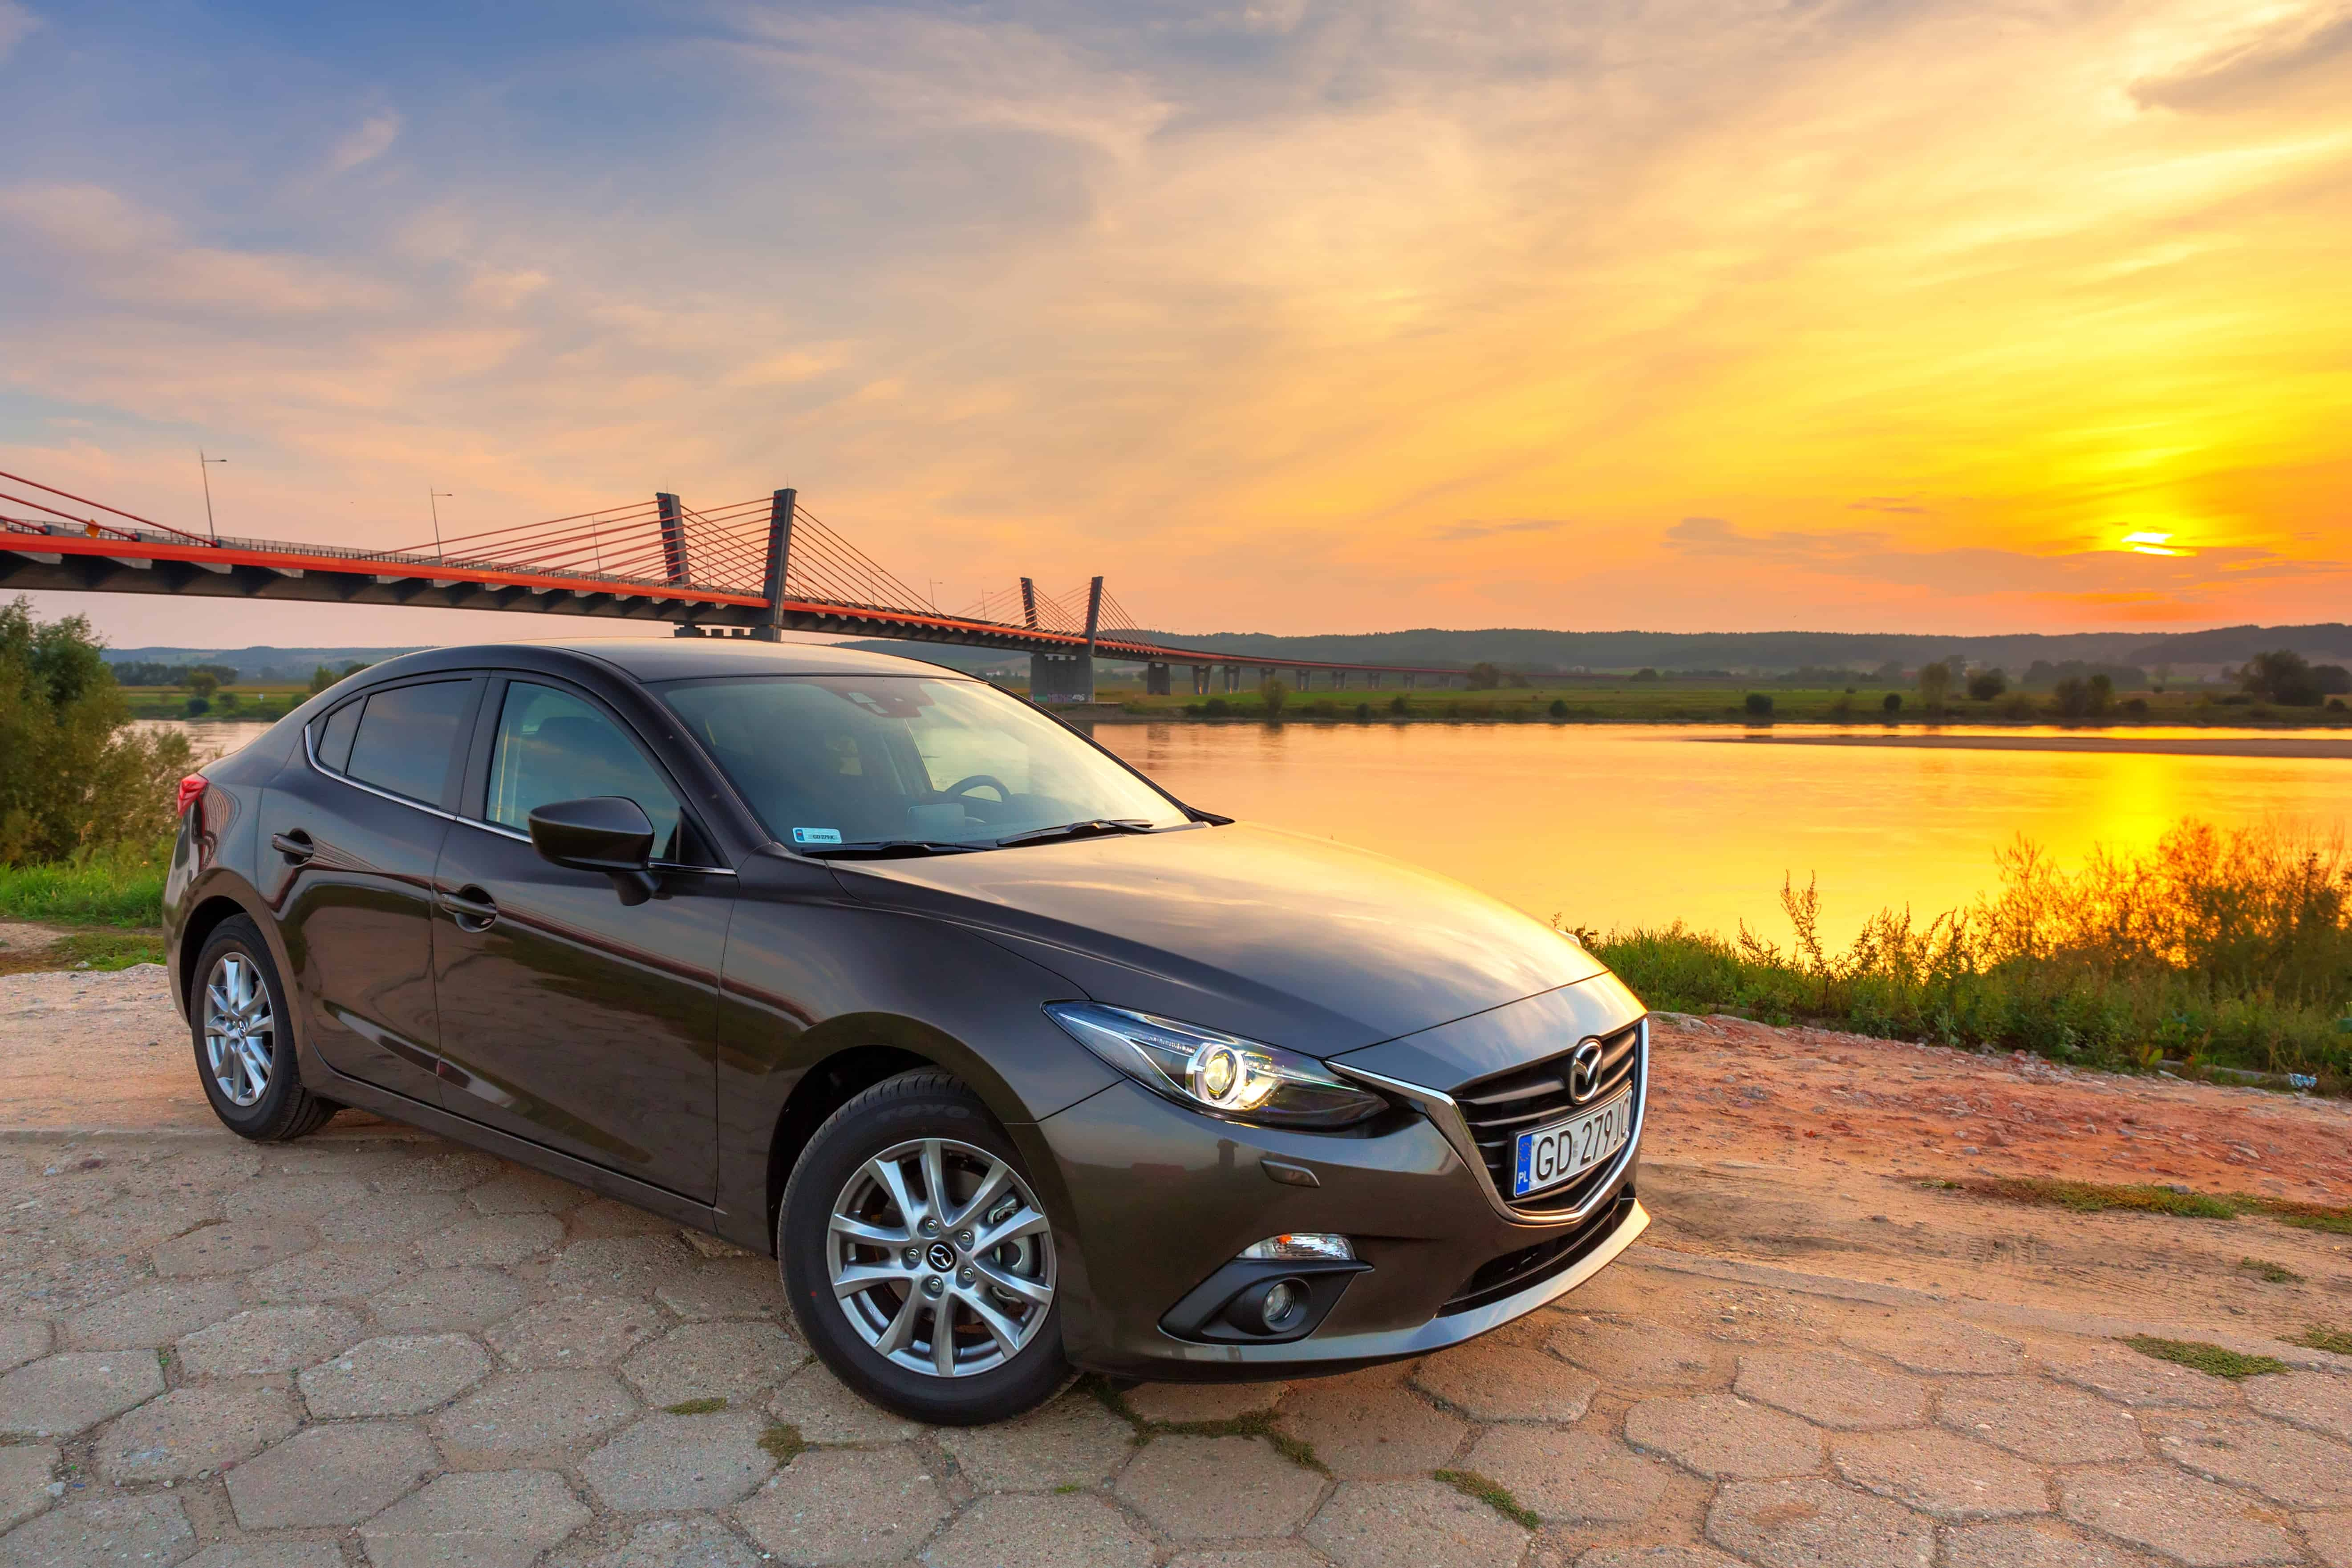 Mazda Recalls 2016-18 Vehicles For Windshield Wiper Failure